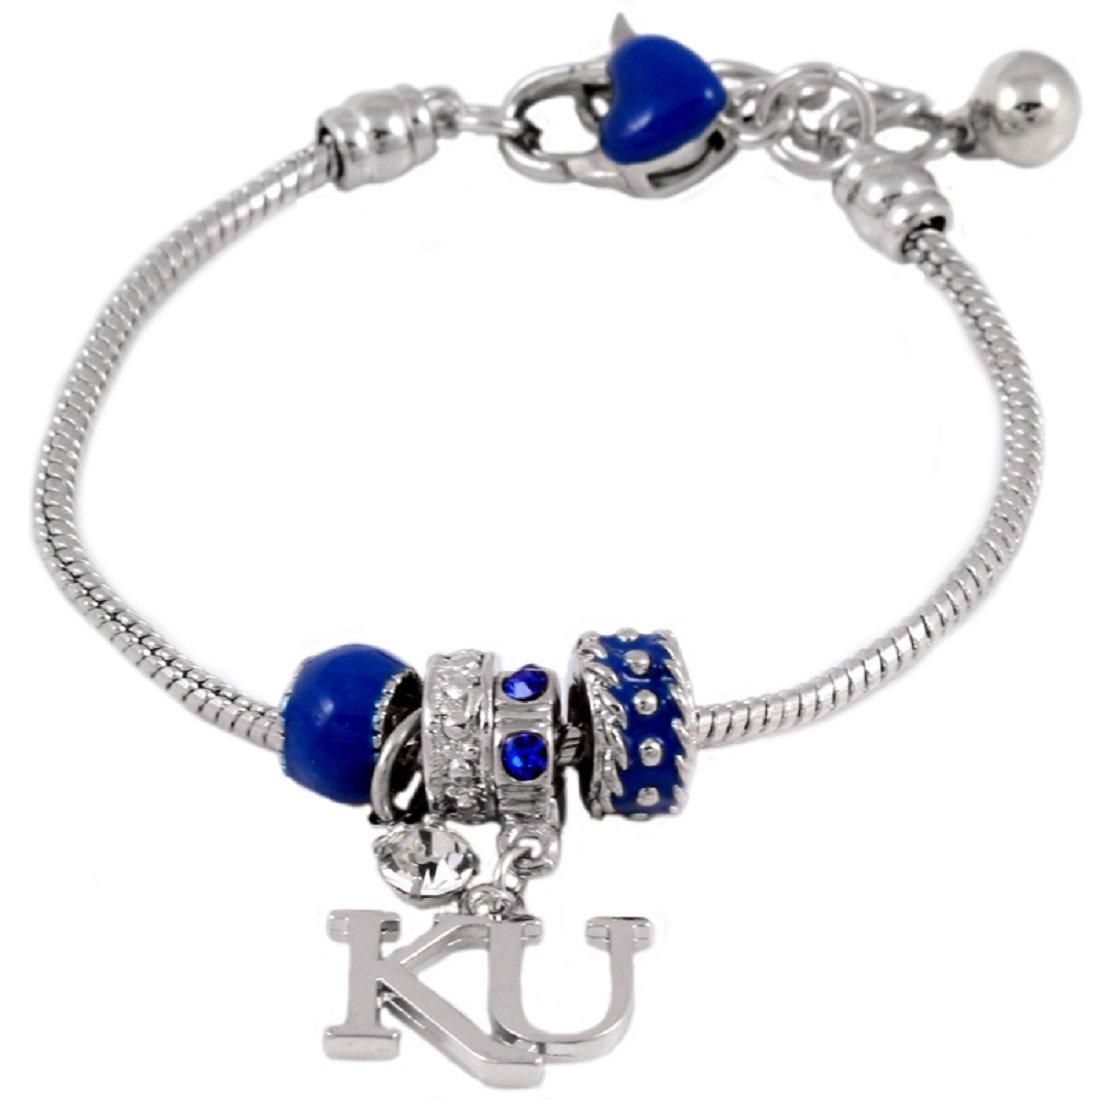 SANDOL Kansas Jayhawks MVP Charm Bracelet with KU Charm